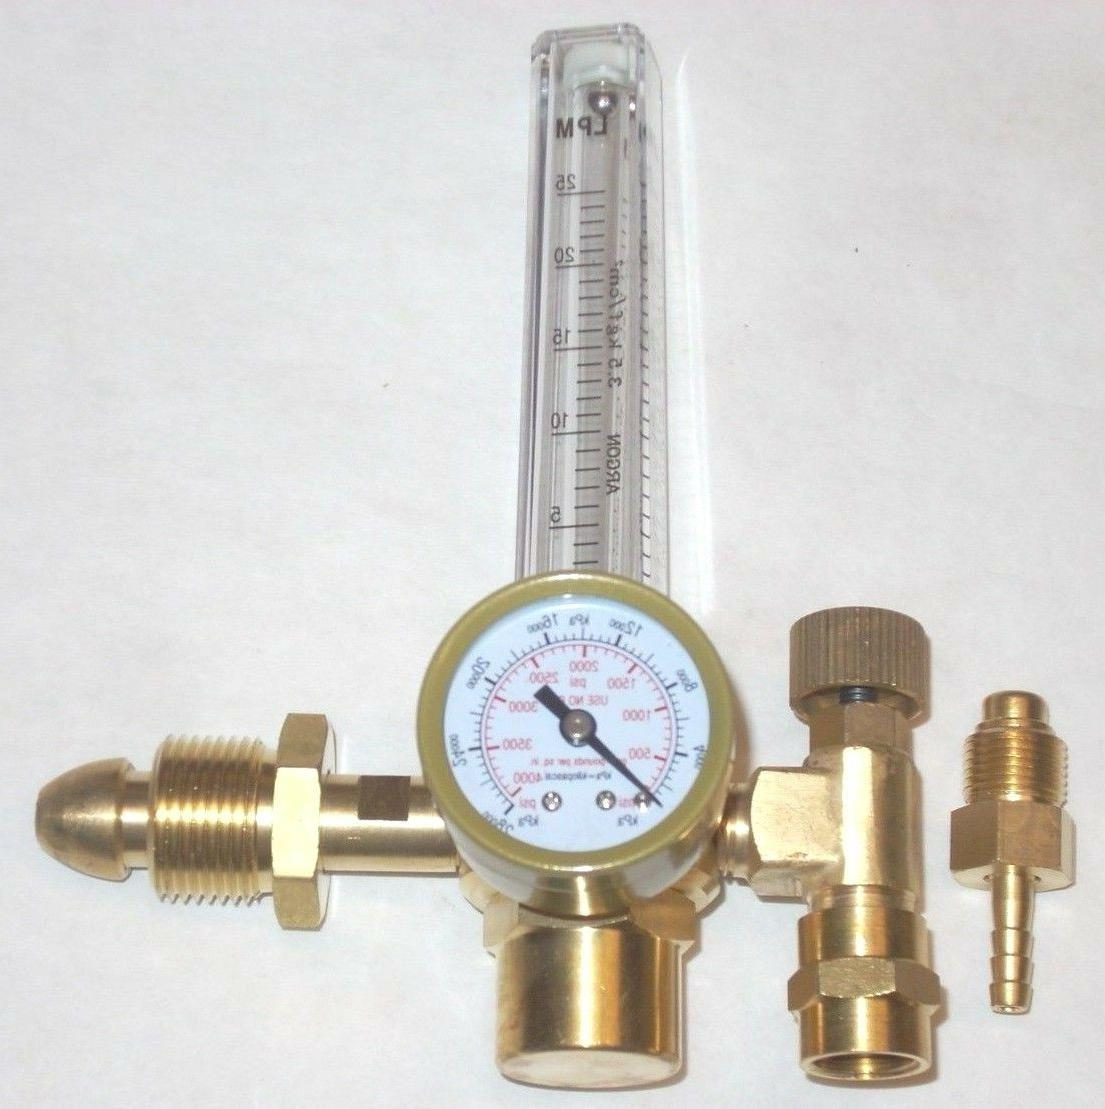 Argon Flowmeter Welding Regulator Gas Hose